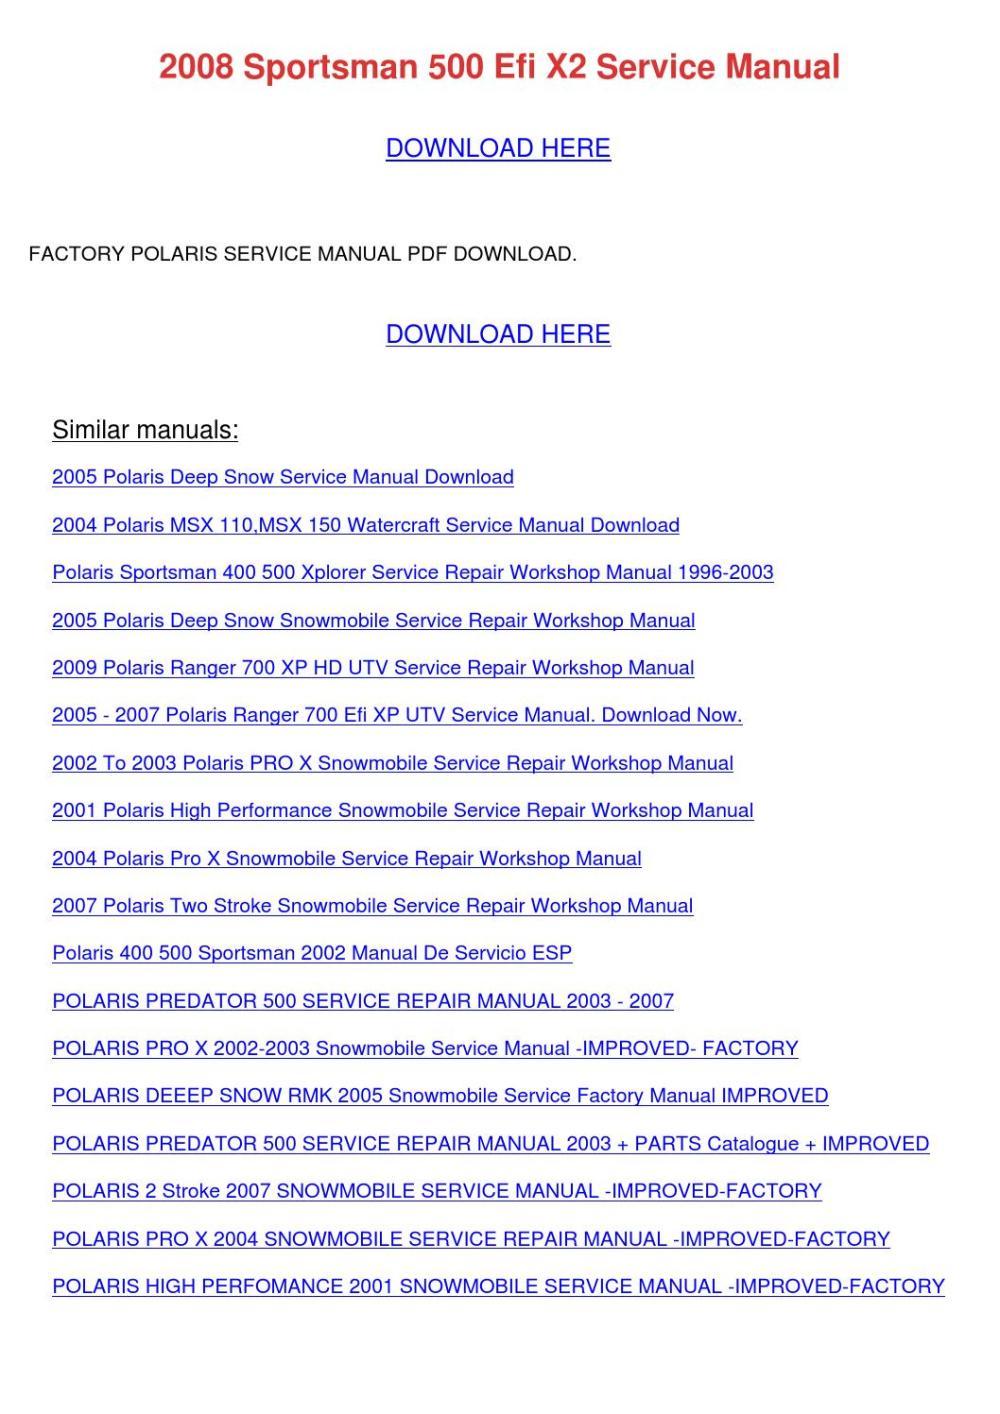 medium resolution of by jeffrey o bennett student study guide and solutions polaris ranger d diesel crew utv service repair manual polaris hawkeye ho h polaris industries